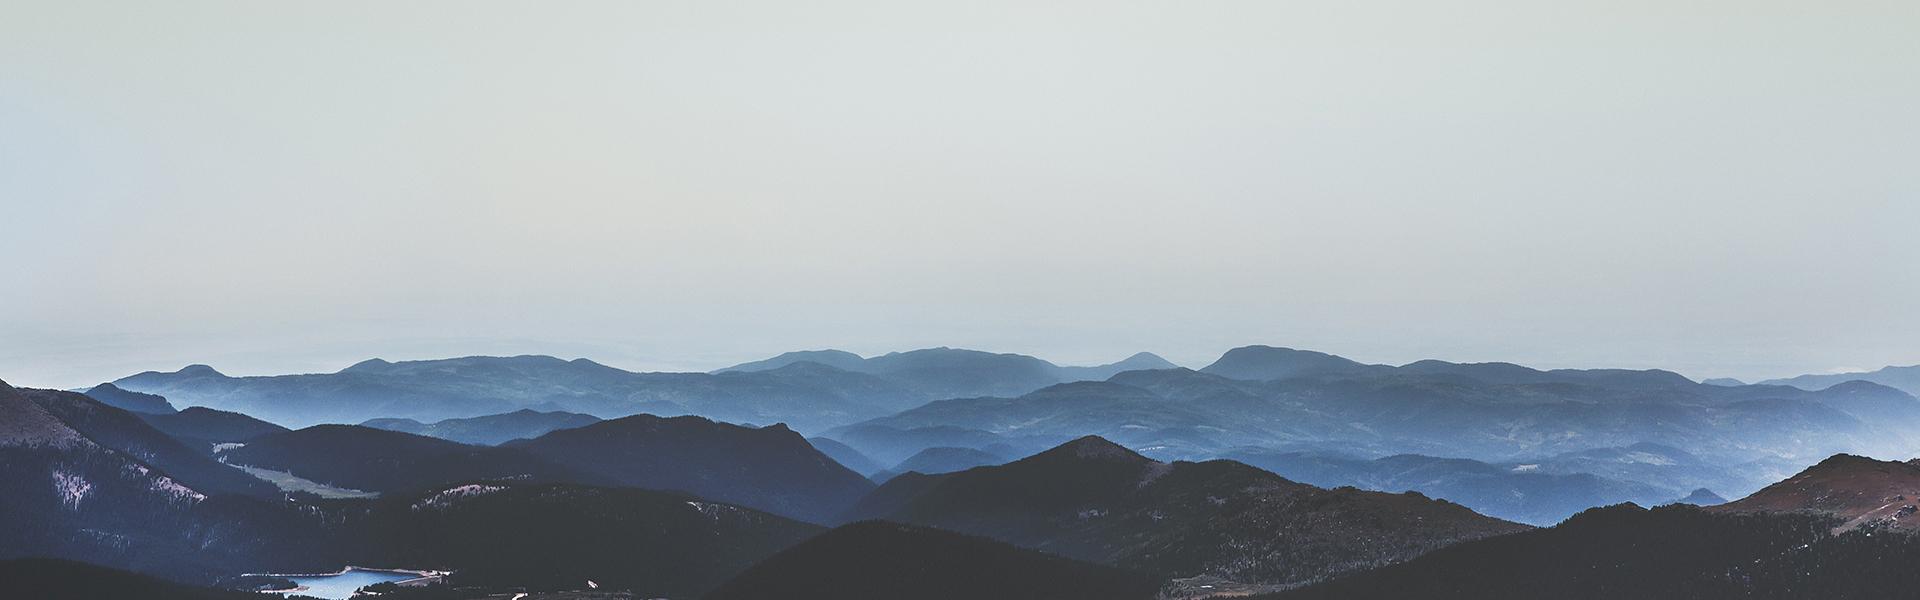 carousel image blue mountains